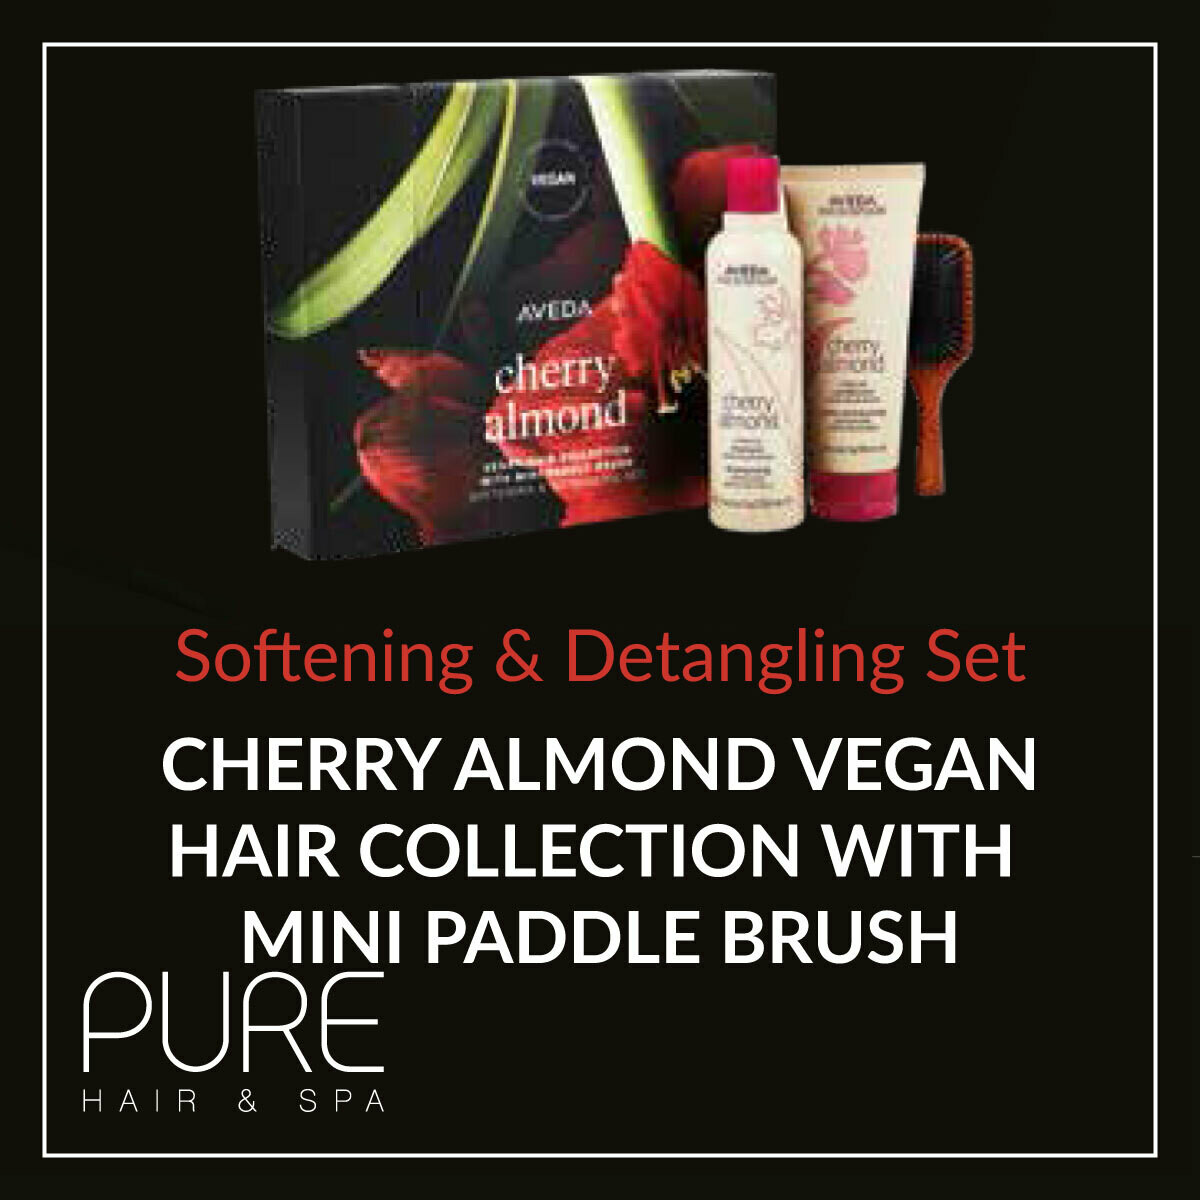 Aveda Cherry Almond Hair Care Gift Set.